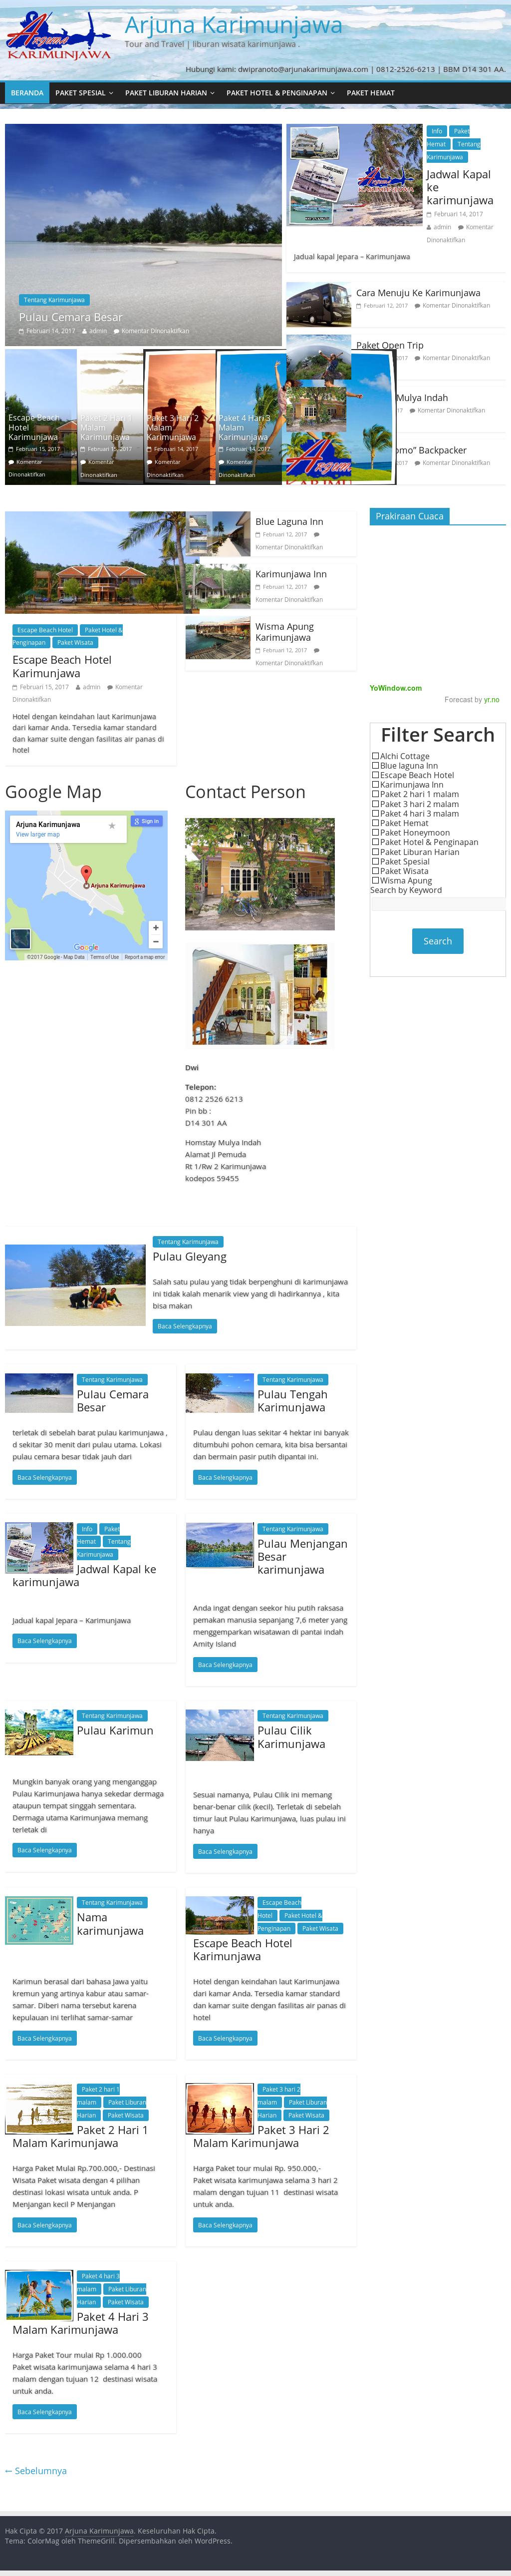 Arjuna Karimun Jawa Tour And Travel Competitors Revenue And